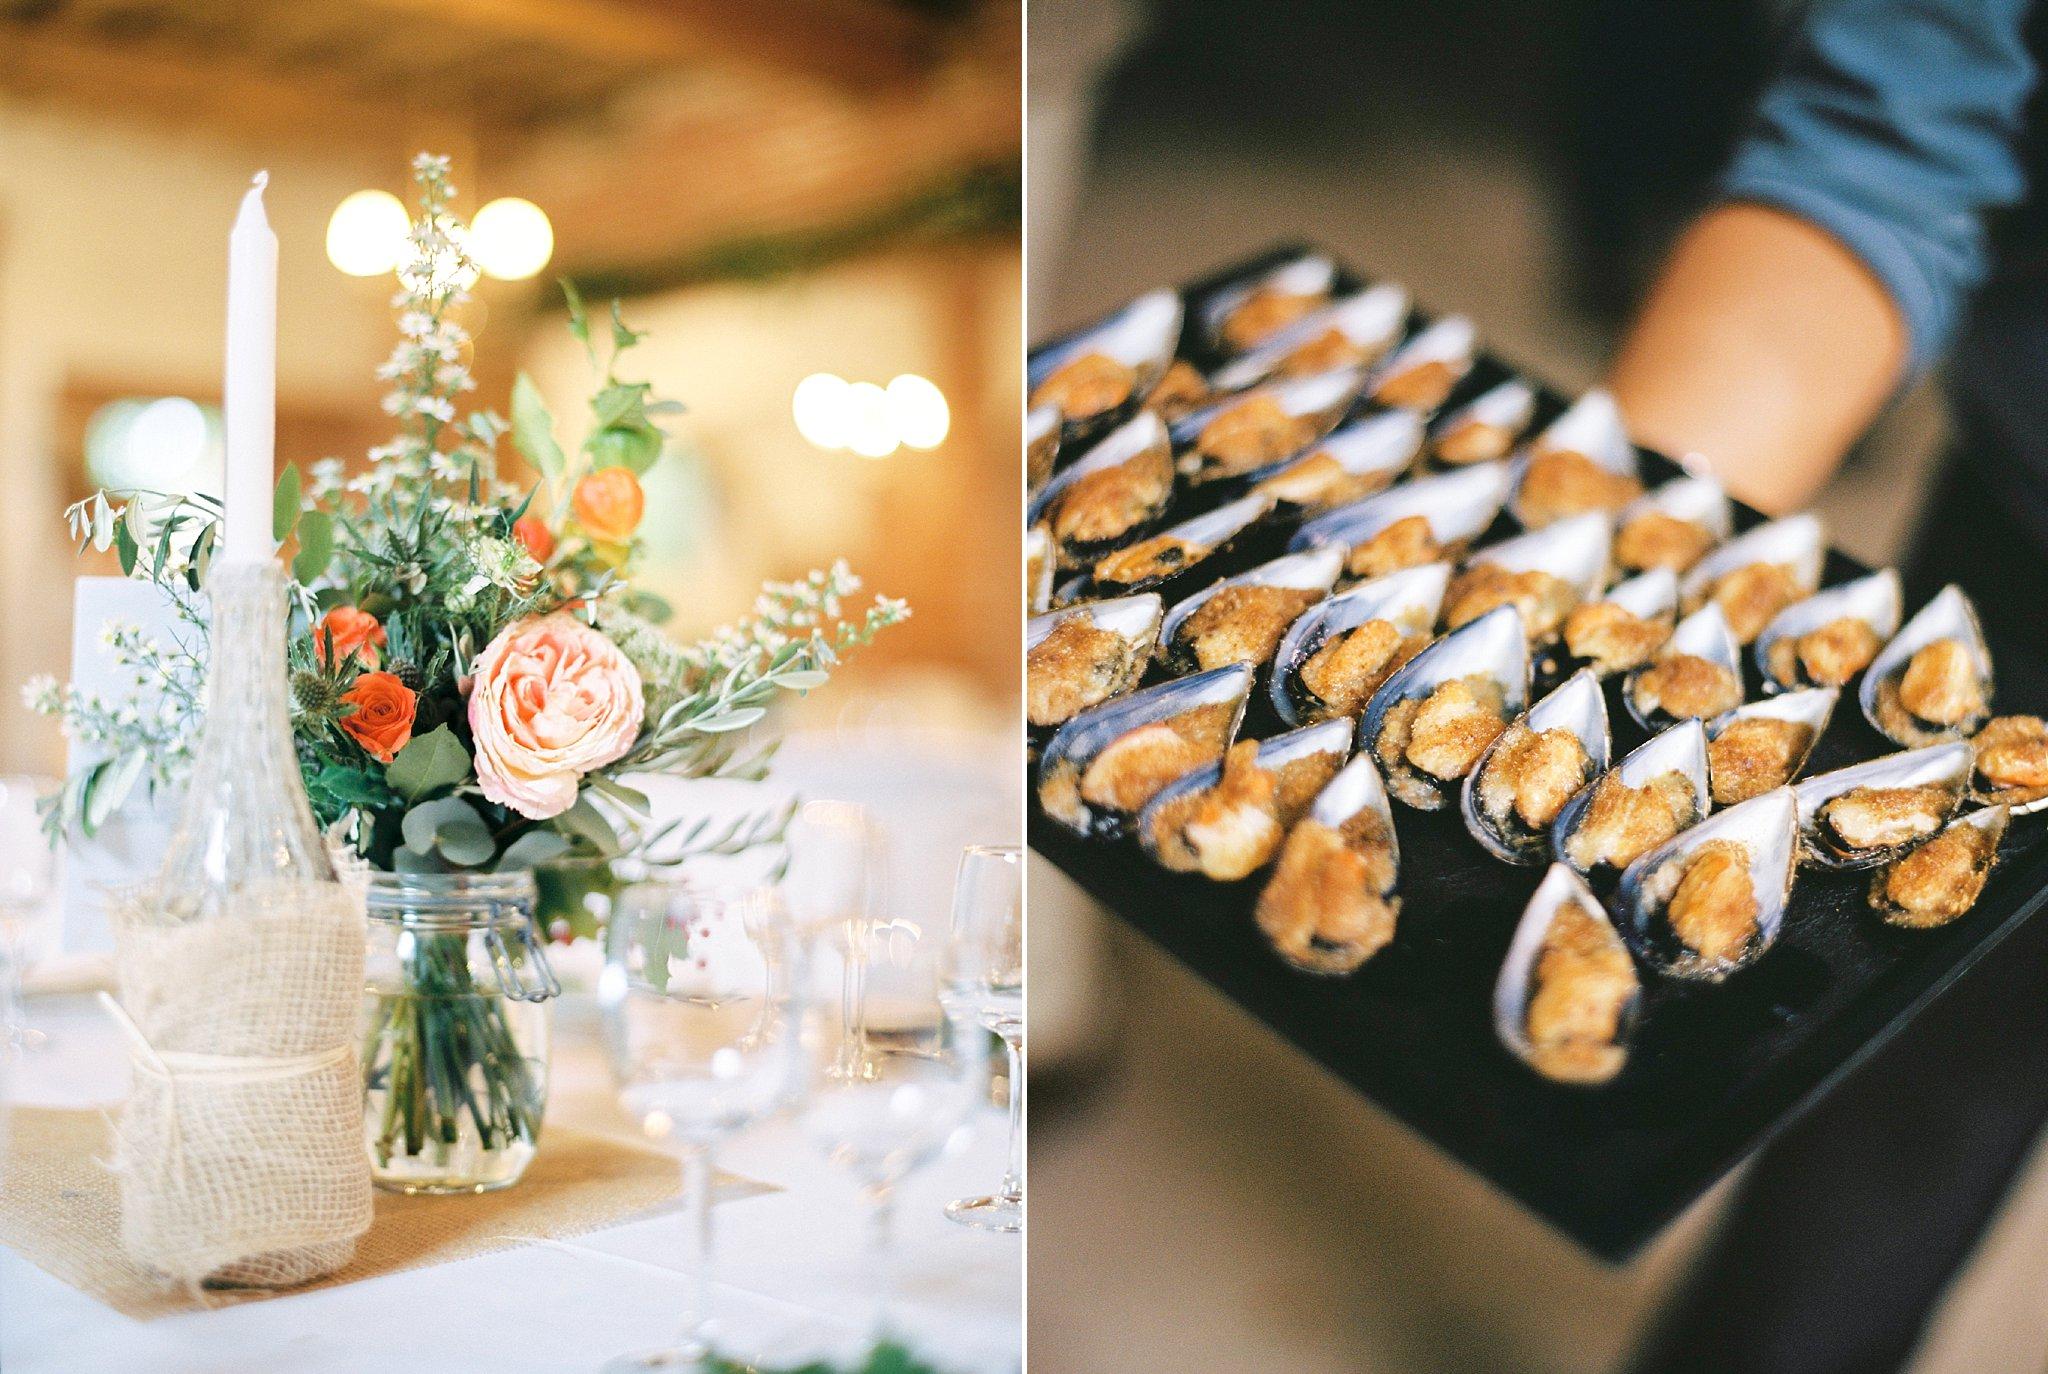 Wedding Photographer Perpignan - Château Las Collas Wedding - Hugo Hennequin062.jpg